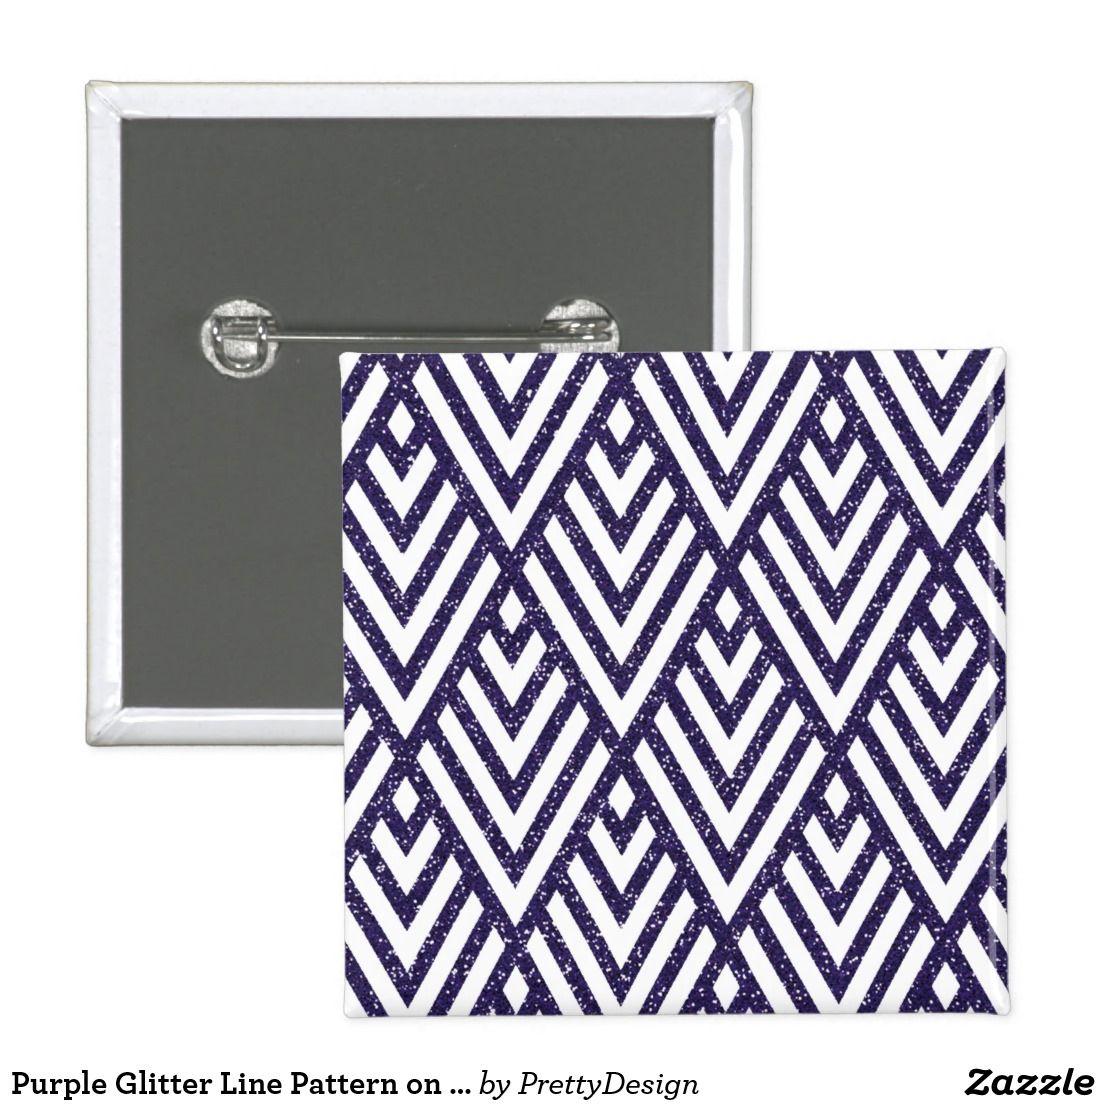 Purple Glitter Line Pattern on Button